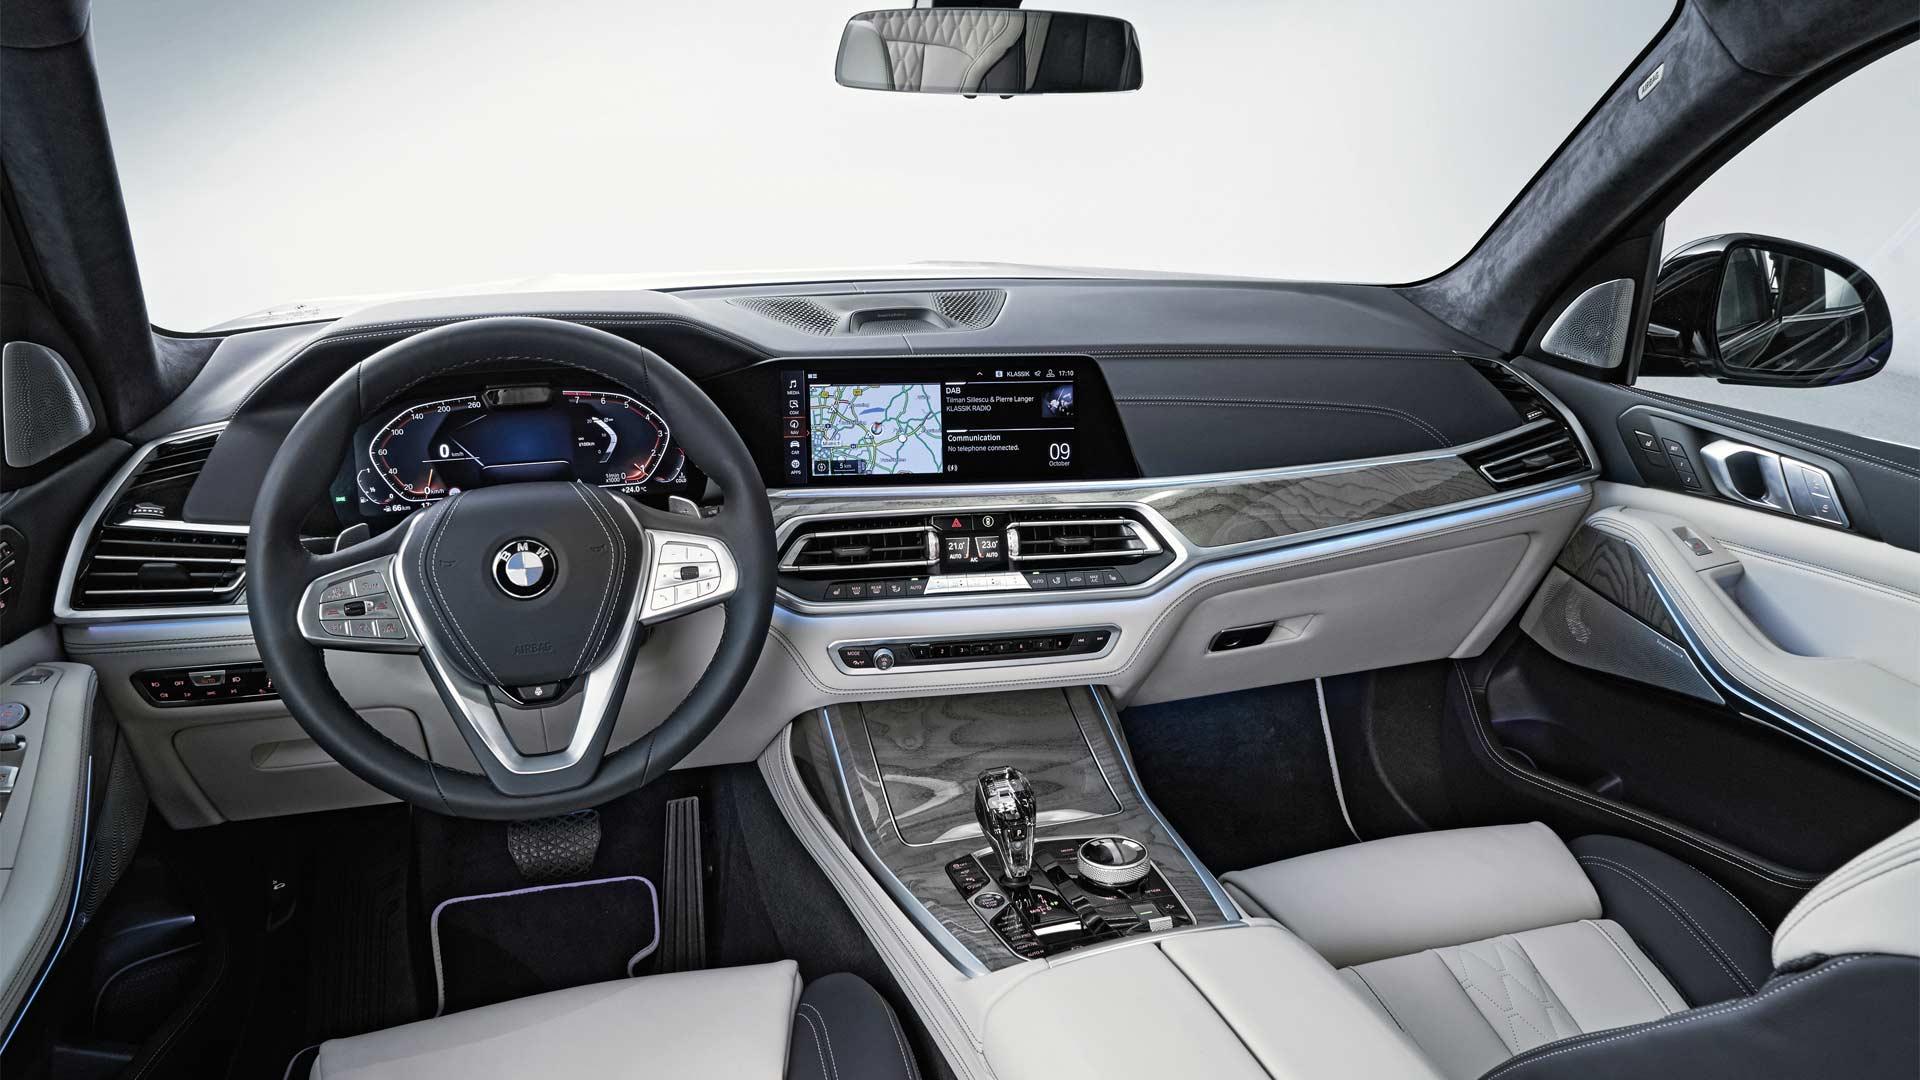 2019-BMW-X7-Interior